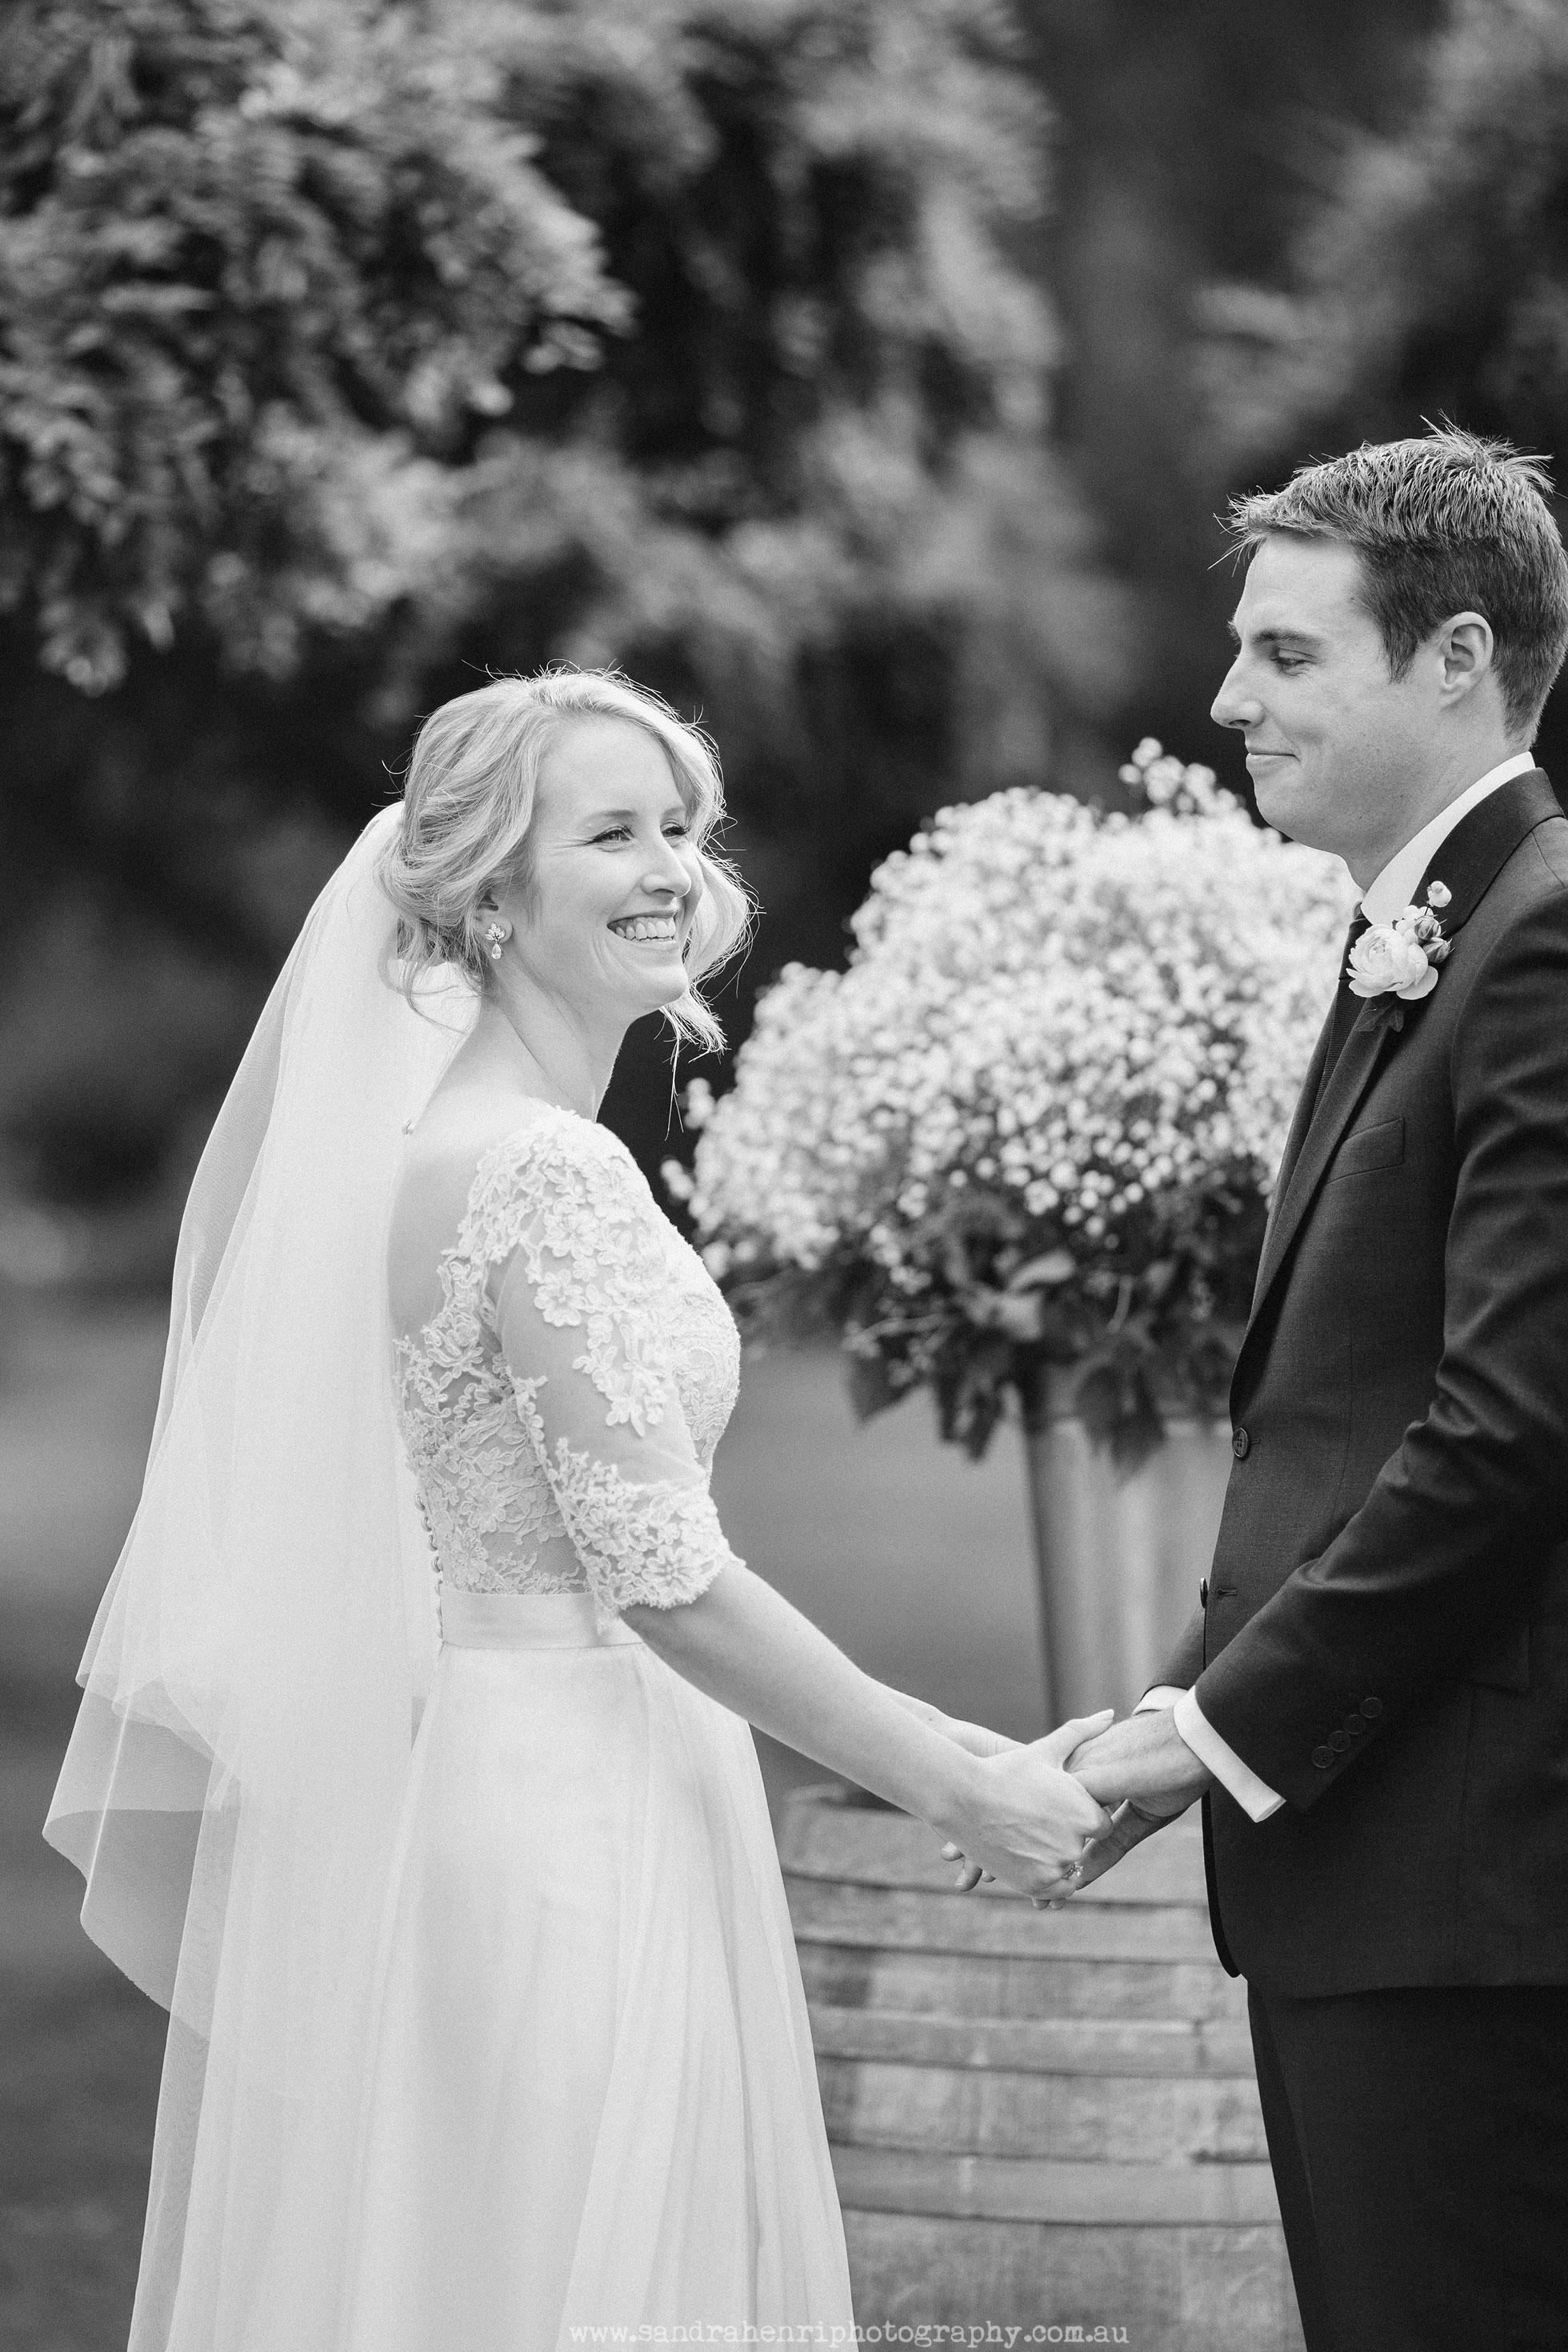 Roberts-Restaurant-garden-wedding-images-18.jpg